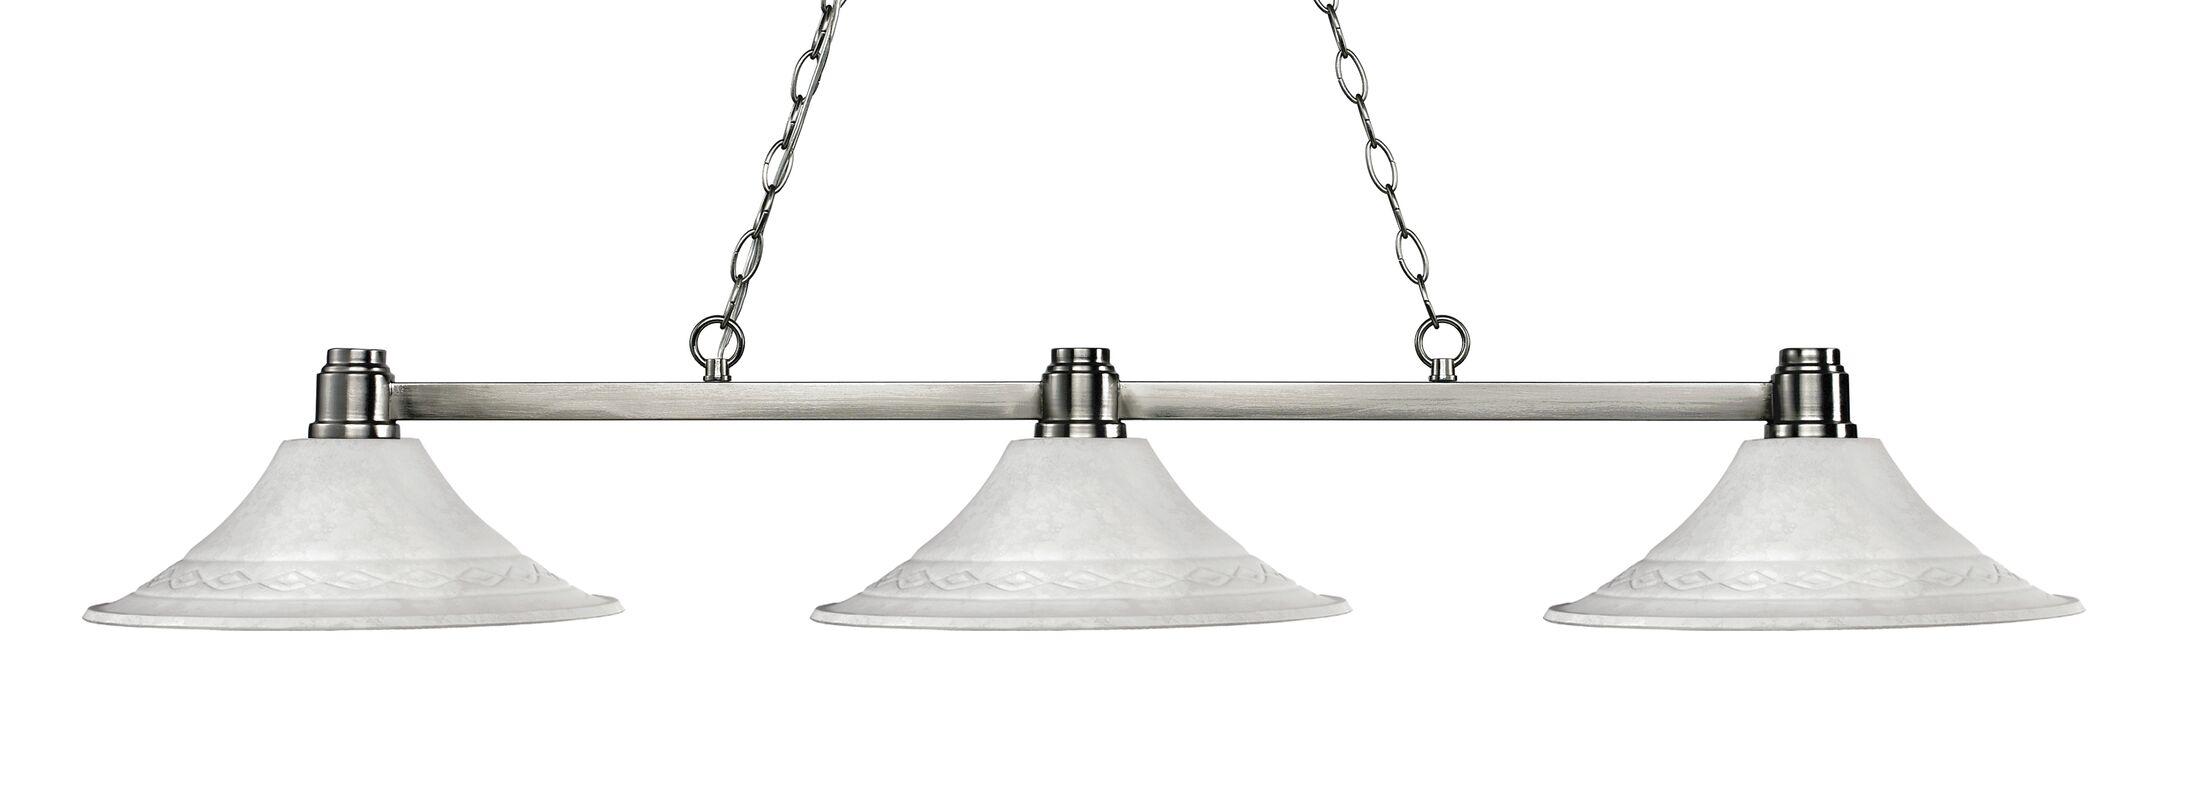 Centeno 3-Light Billiard Light Finish: Brushed Nickel, Shade Color: Fluted White Mottle